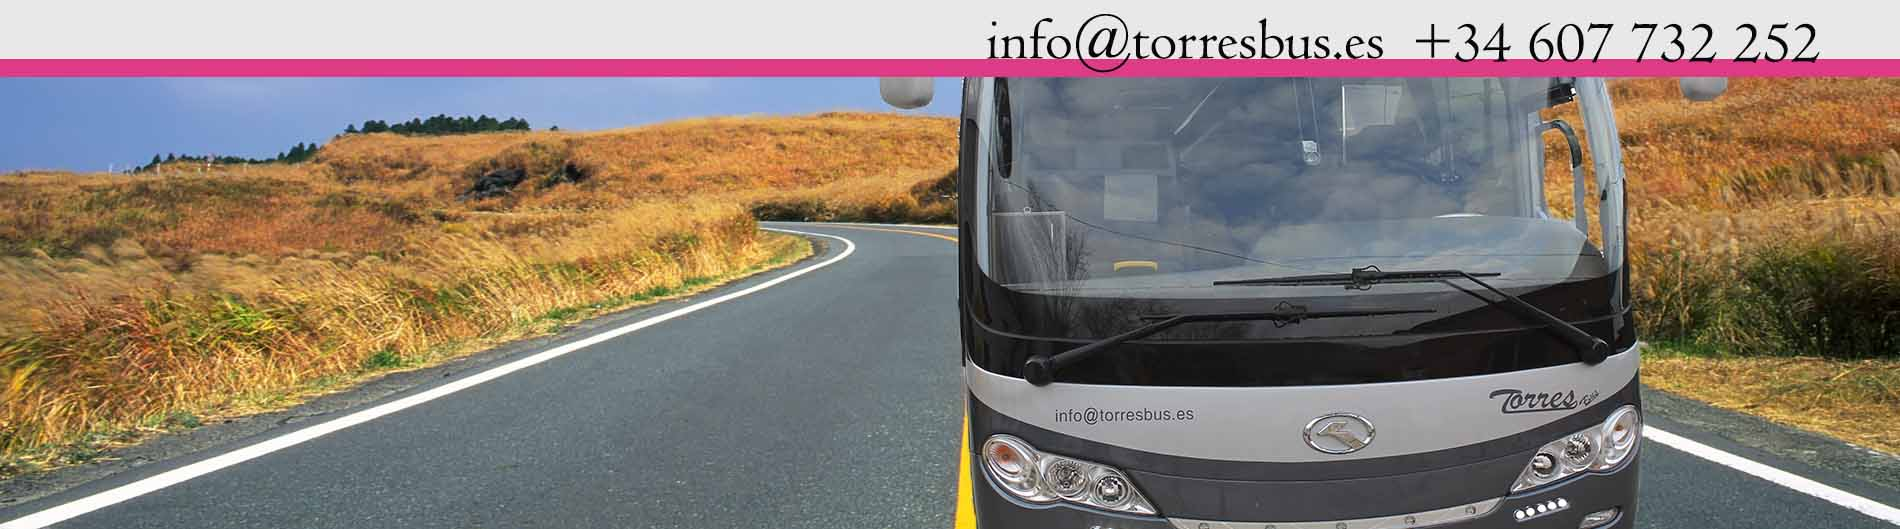 Alquiler de minibuses con conductor | Alquiler de un minibús